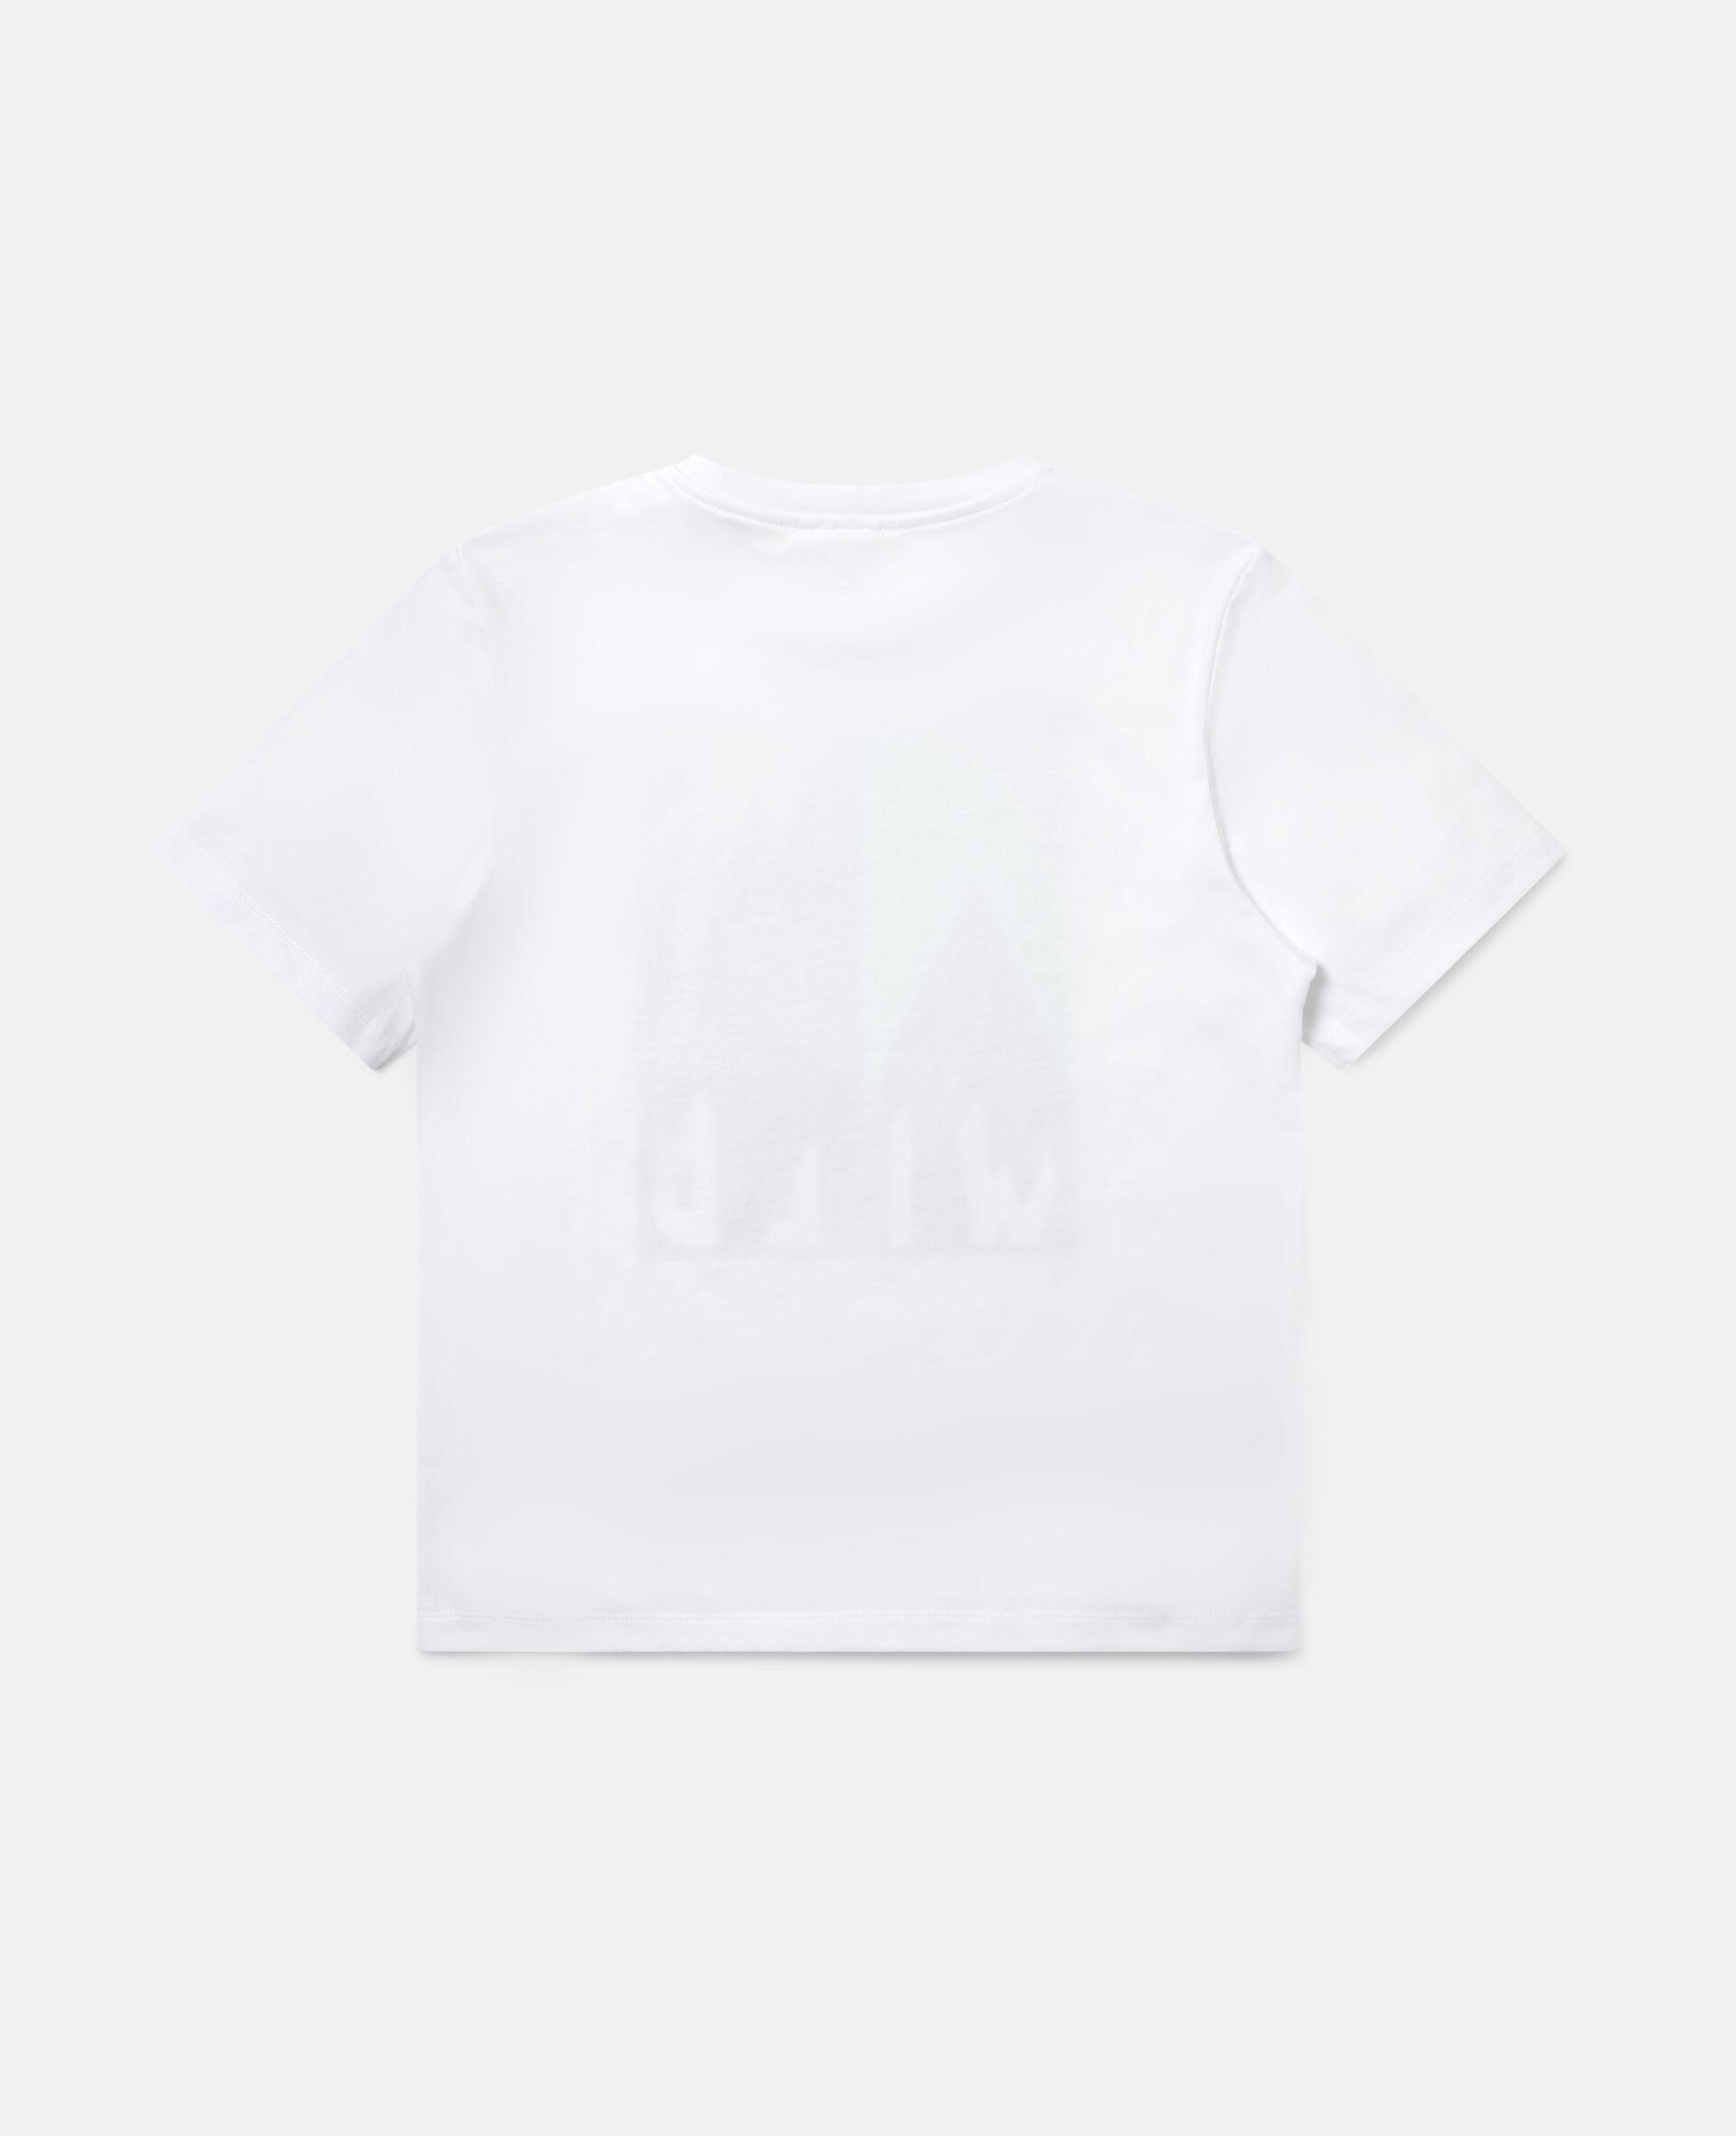 Oversized Graphic Mountain T-shirt-White-large image number 3